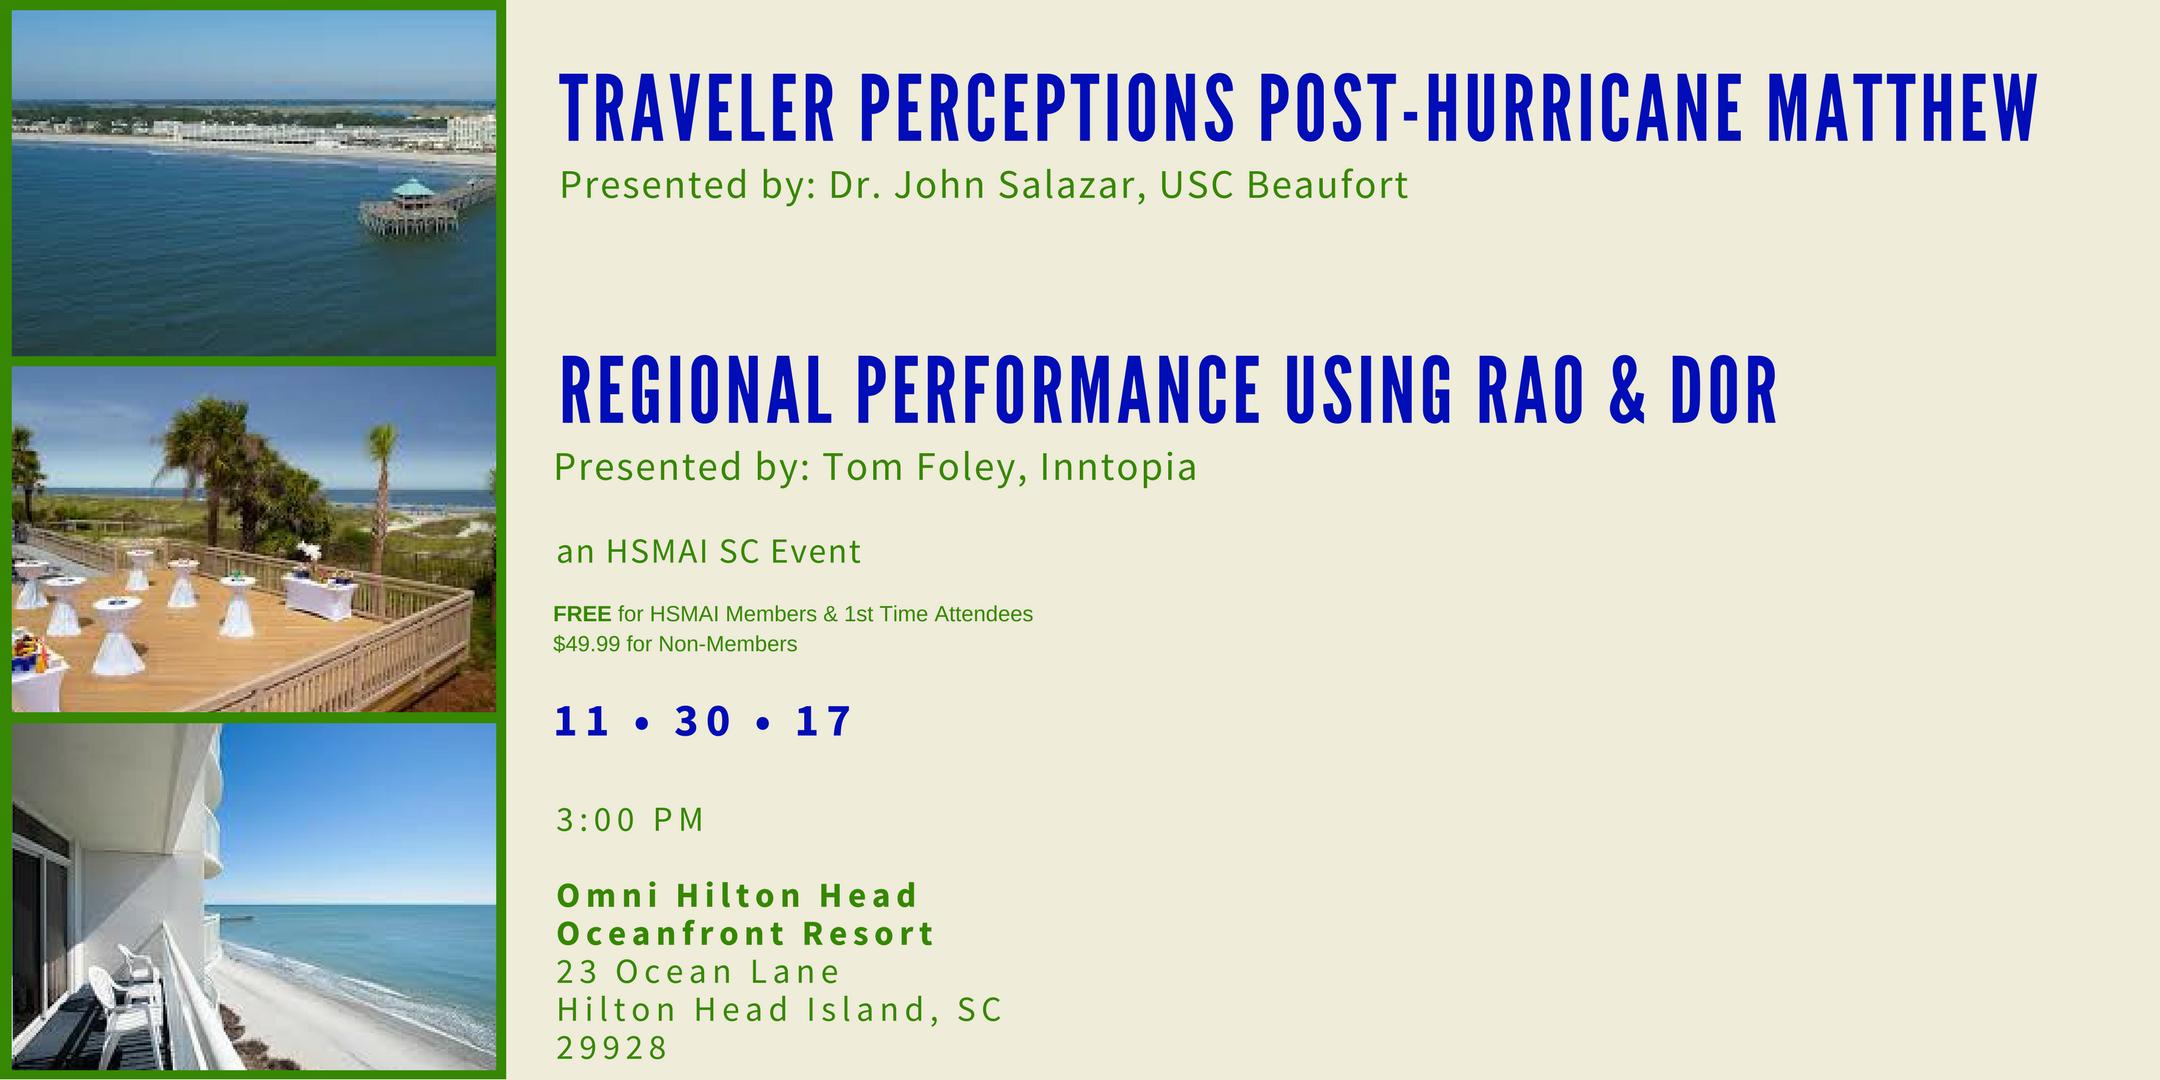 Traveler Perceptions Post-Hurricane Matthew & Regional Performance